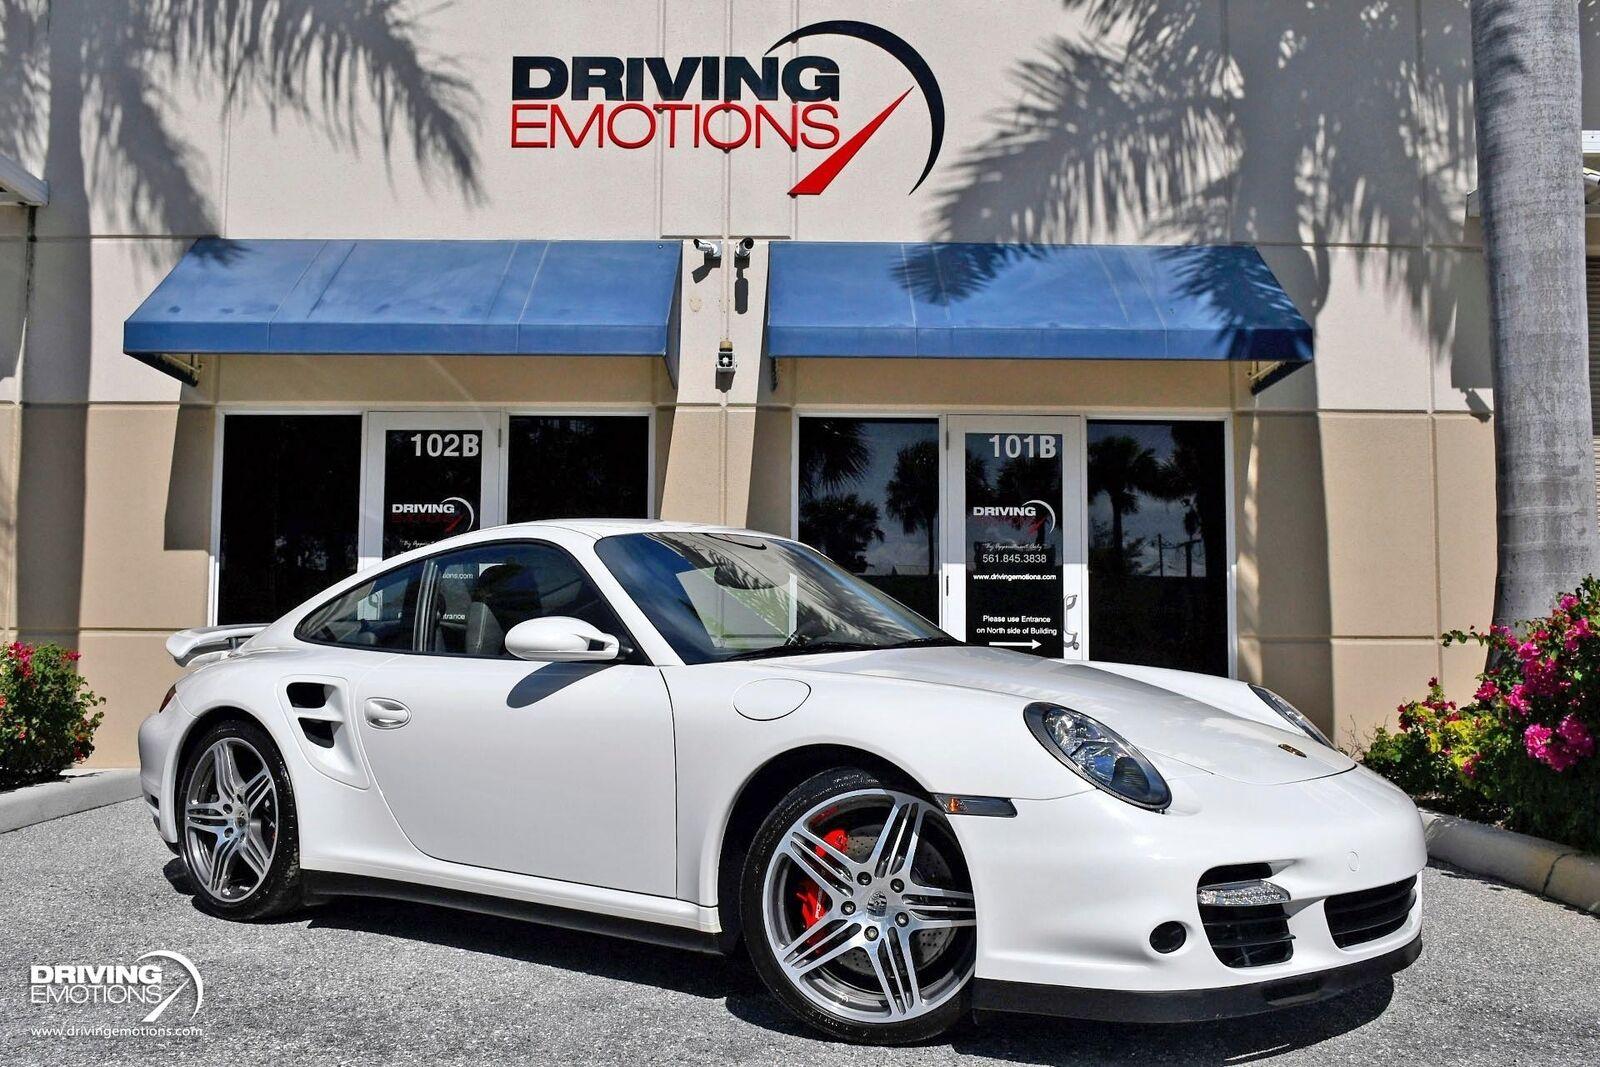 2008 Porsche 911 Turbo Coupe Turbo $136k MSRP! Carbon Package!! 19251 Miles Carr